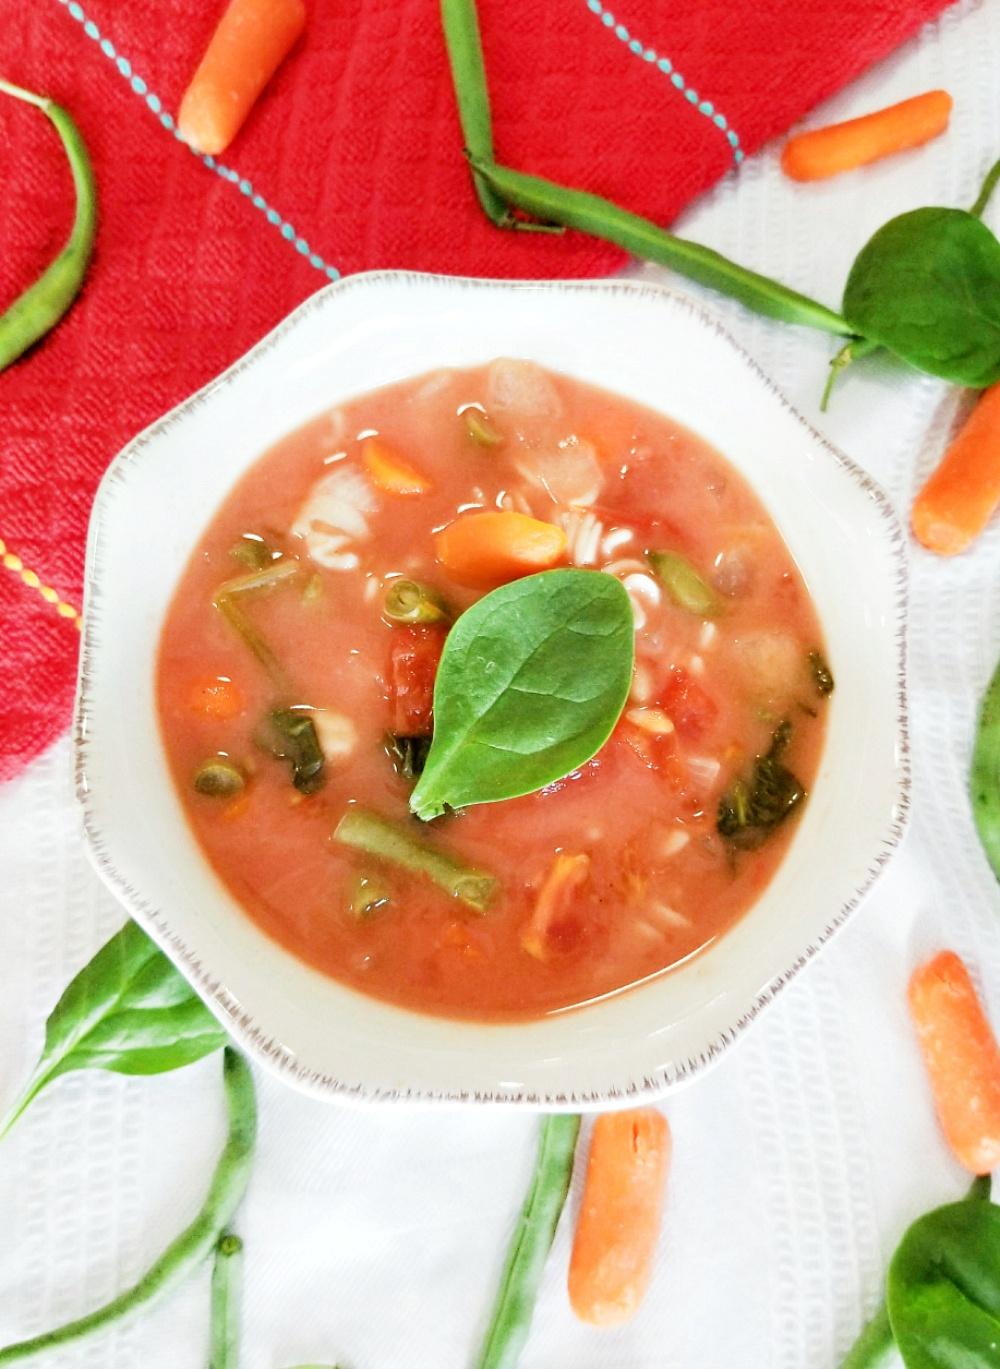 Best Slow Cooker Vegetable Soup